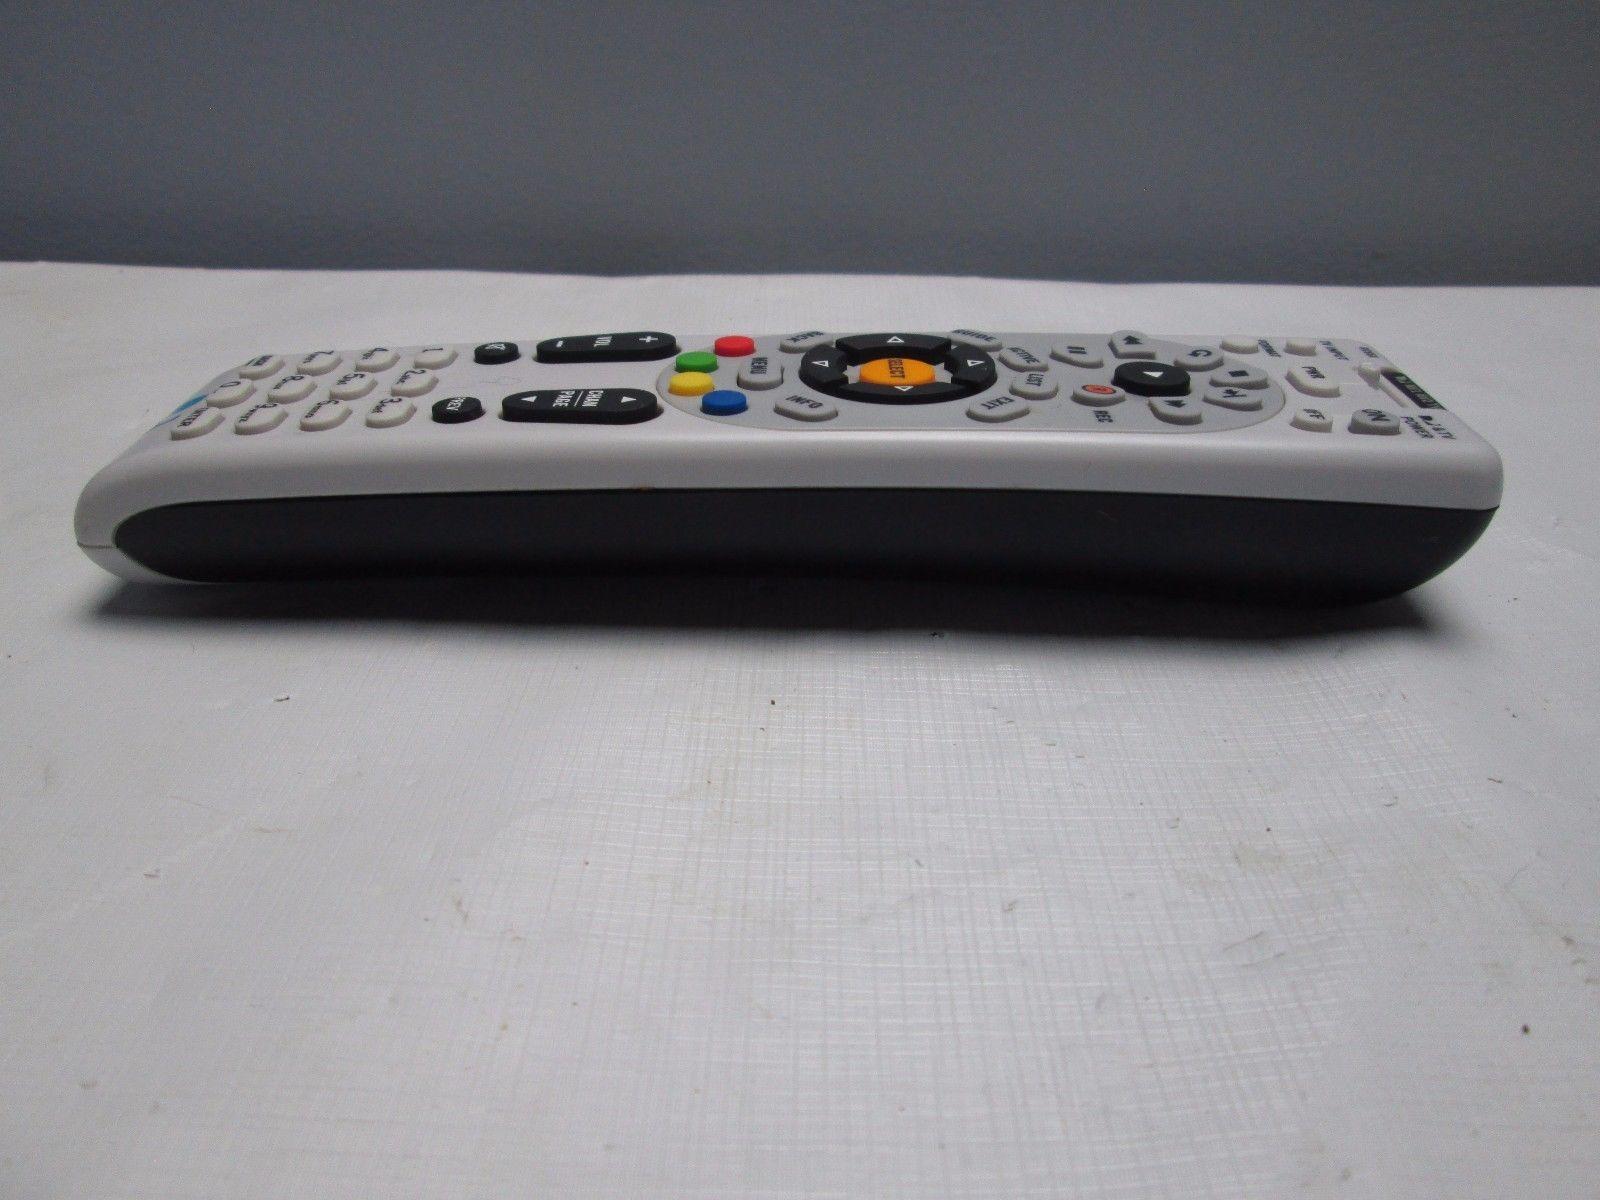 Directv RC65X Universal IR Remote Control Direct TV H24 H25 HR24